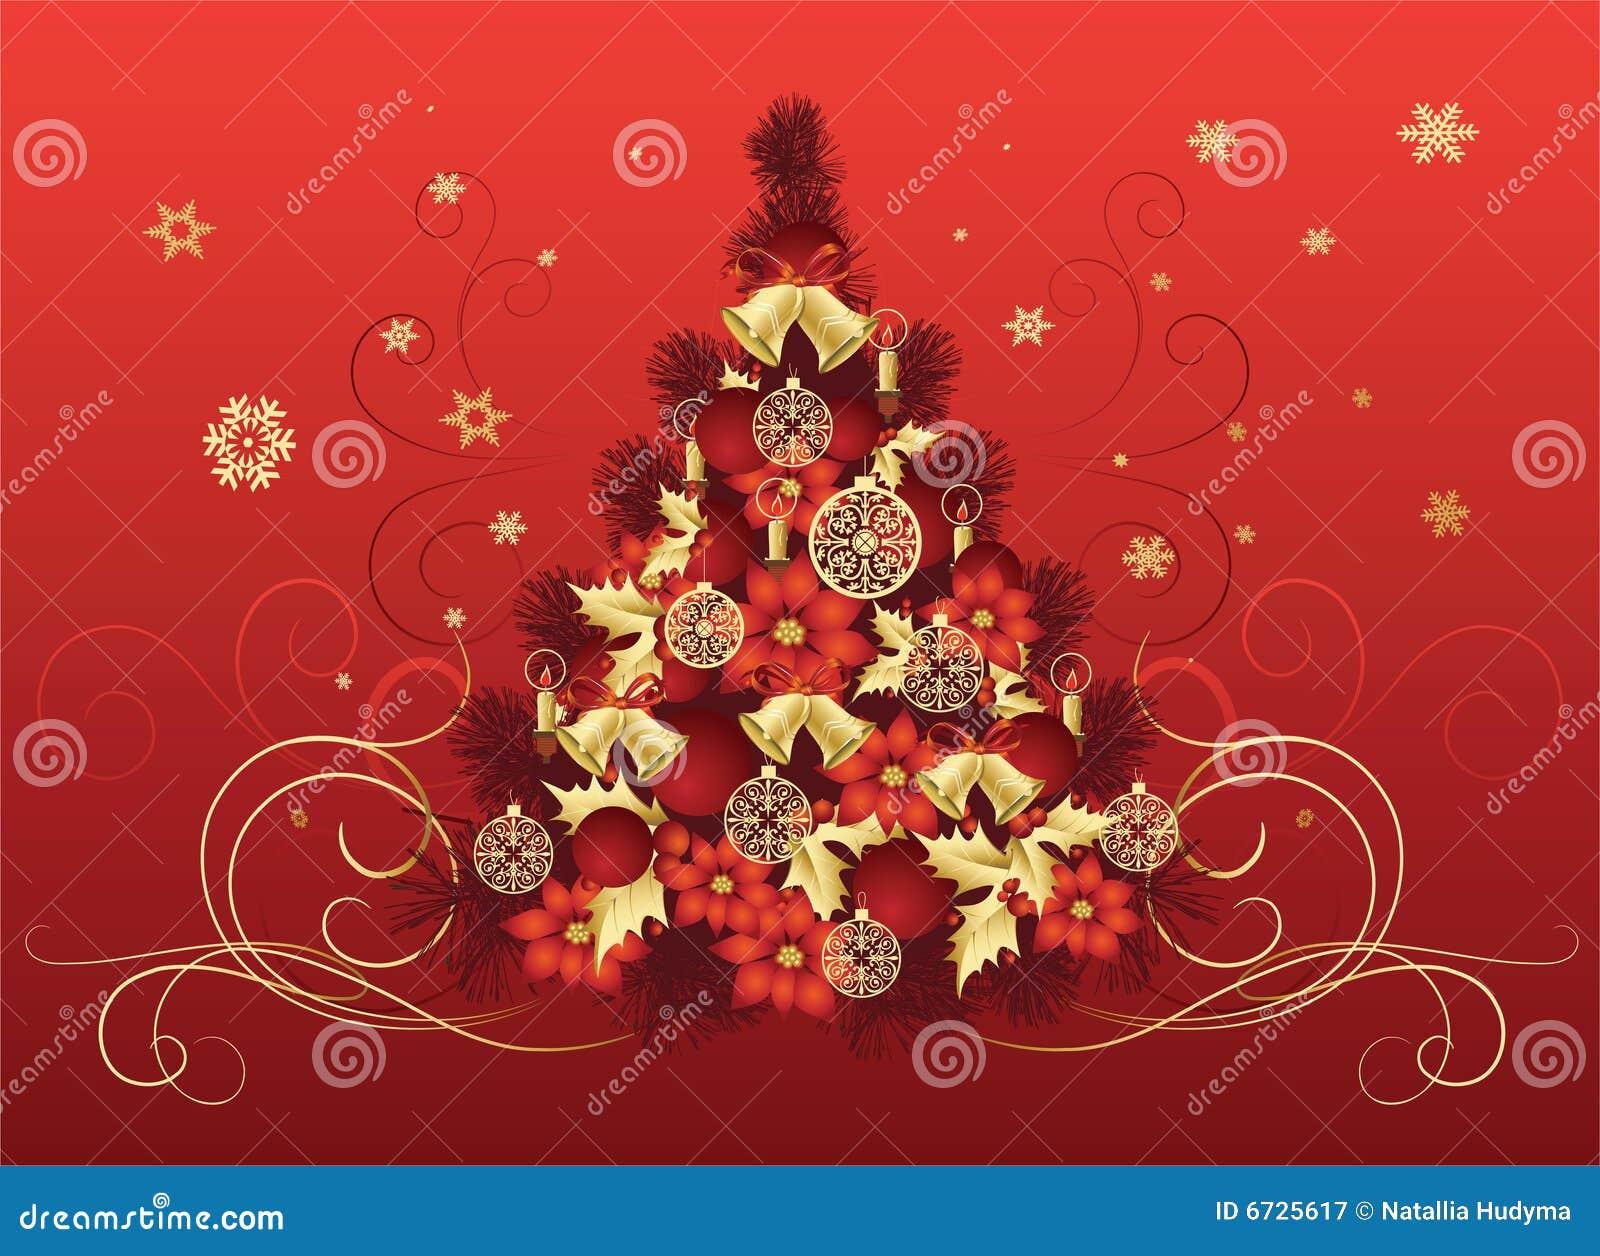 Dise o del rbol de navidad fotograf a de archivo libre de - Diseno de arboles de navidad ...